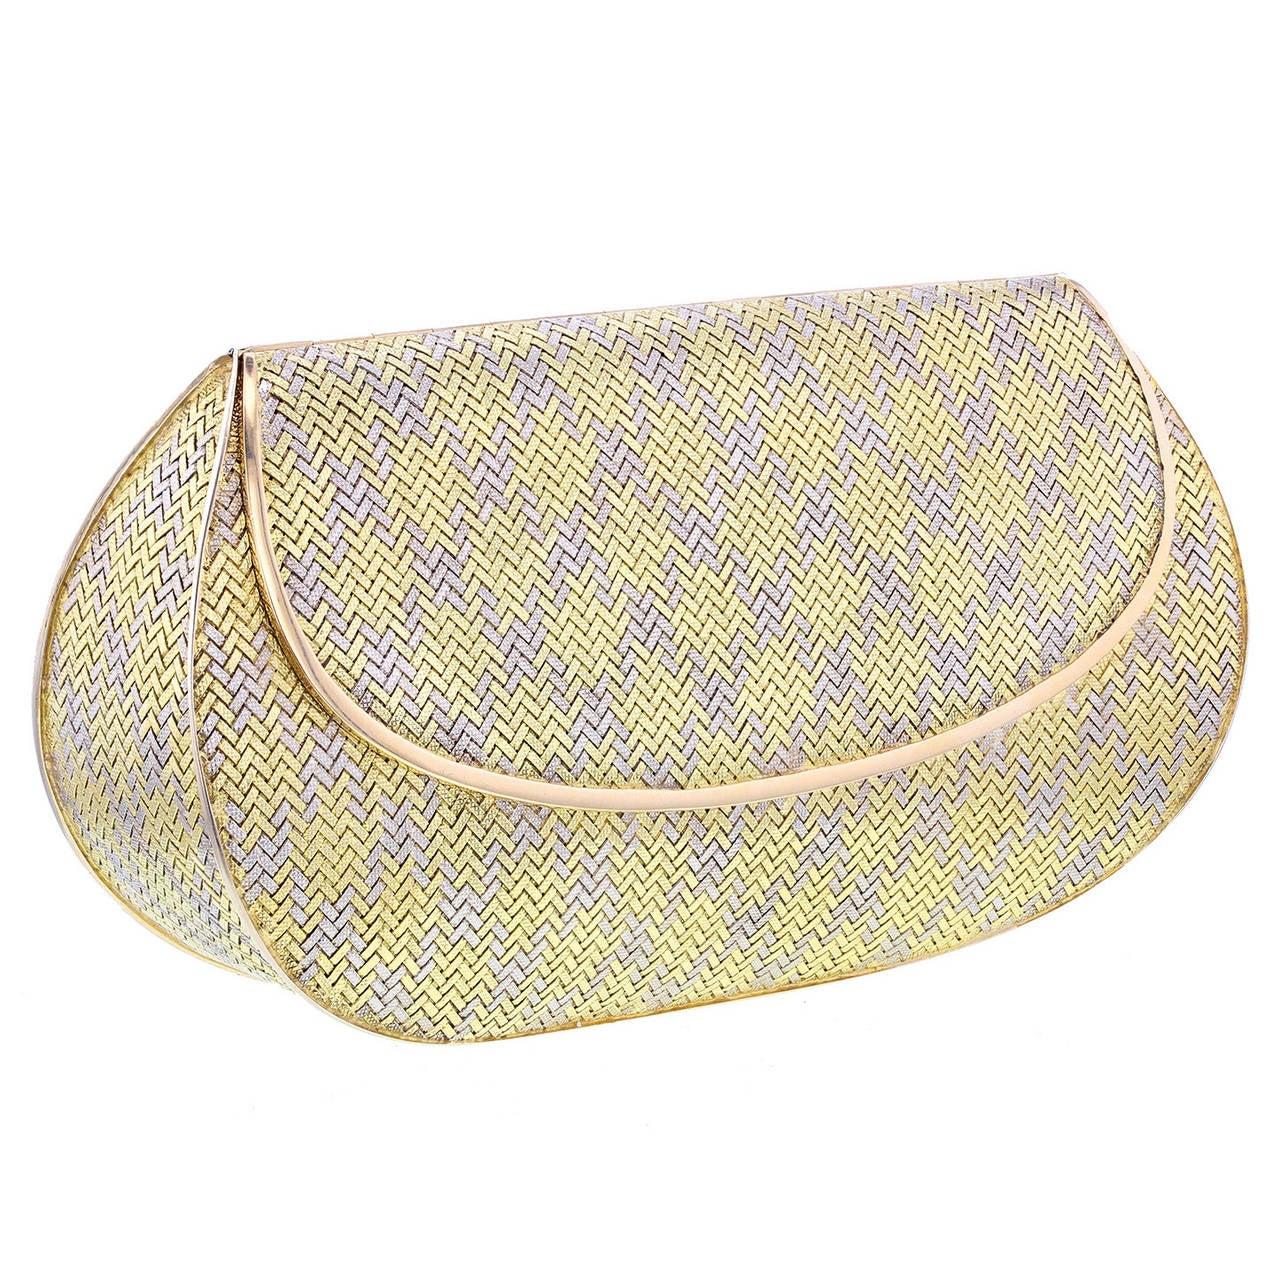 1960s Mancini e Lefevre Two Color Woven Gold Clutch Bag